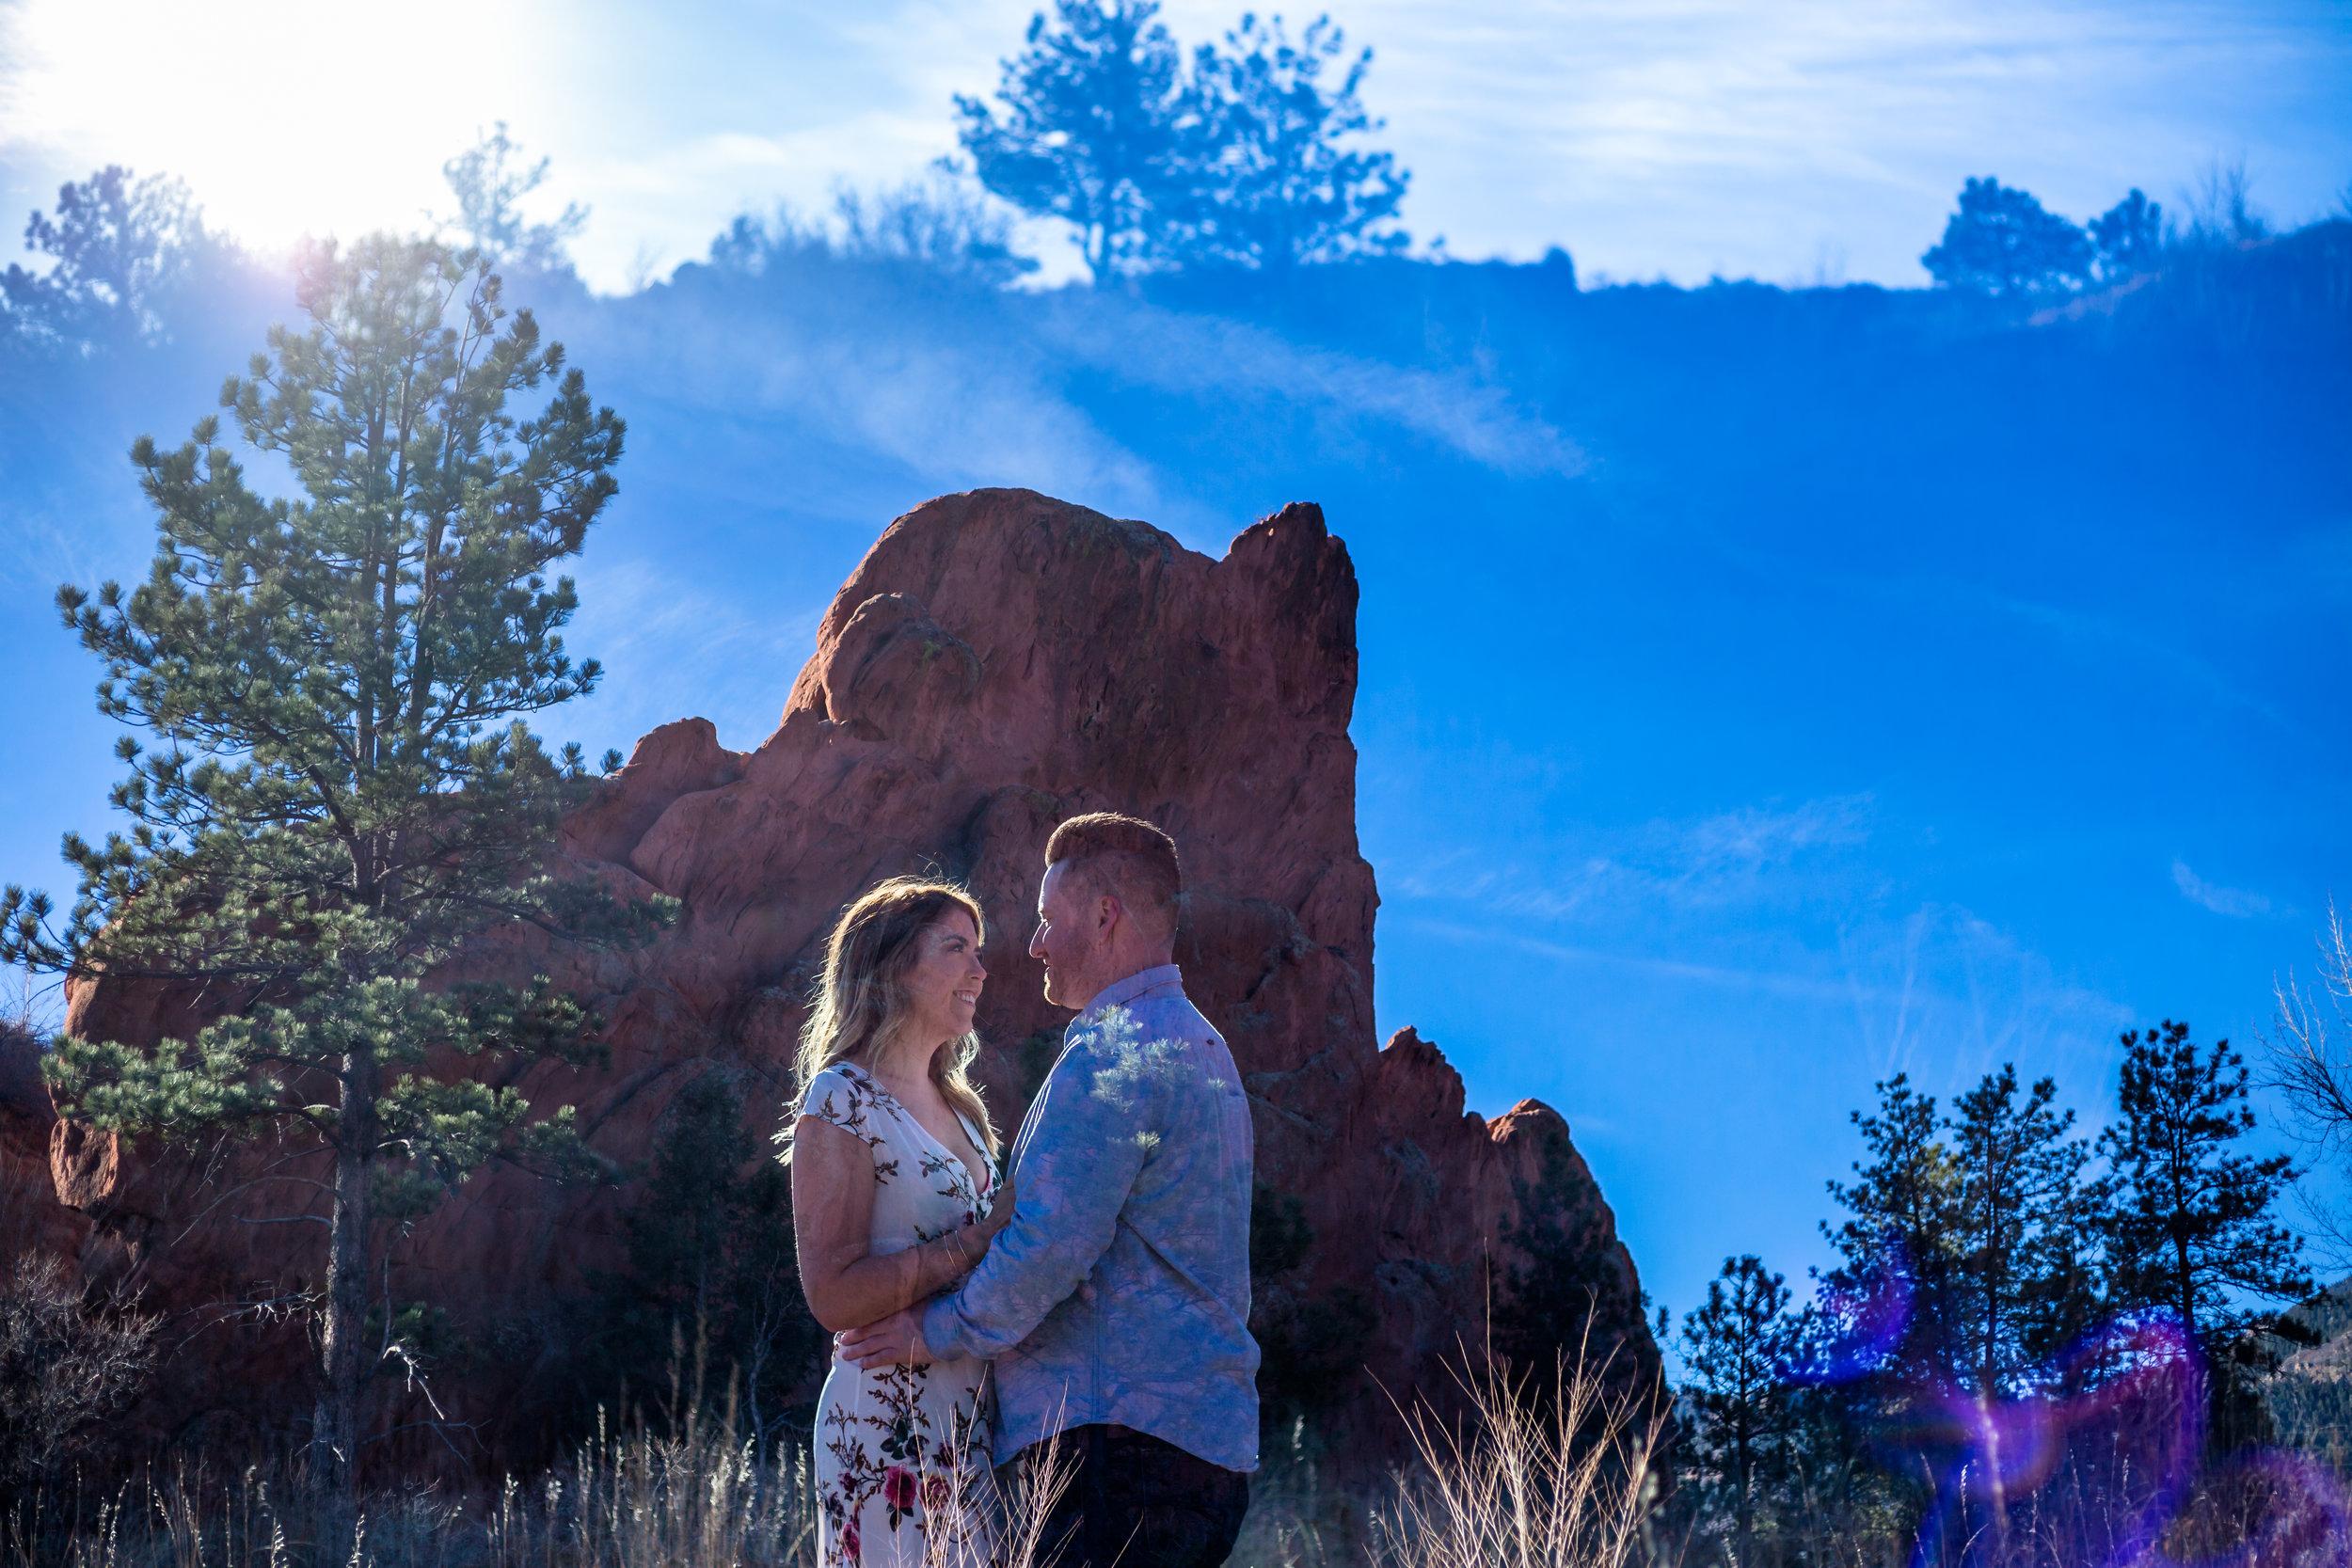 Mikayla & Kelsey - Colorado Springs, CO